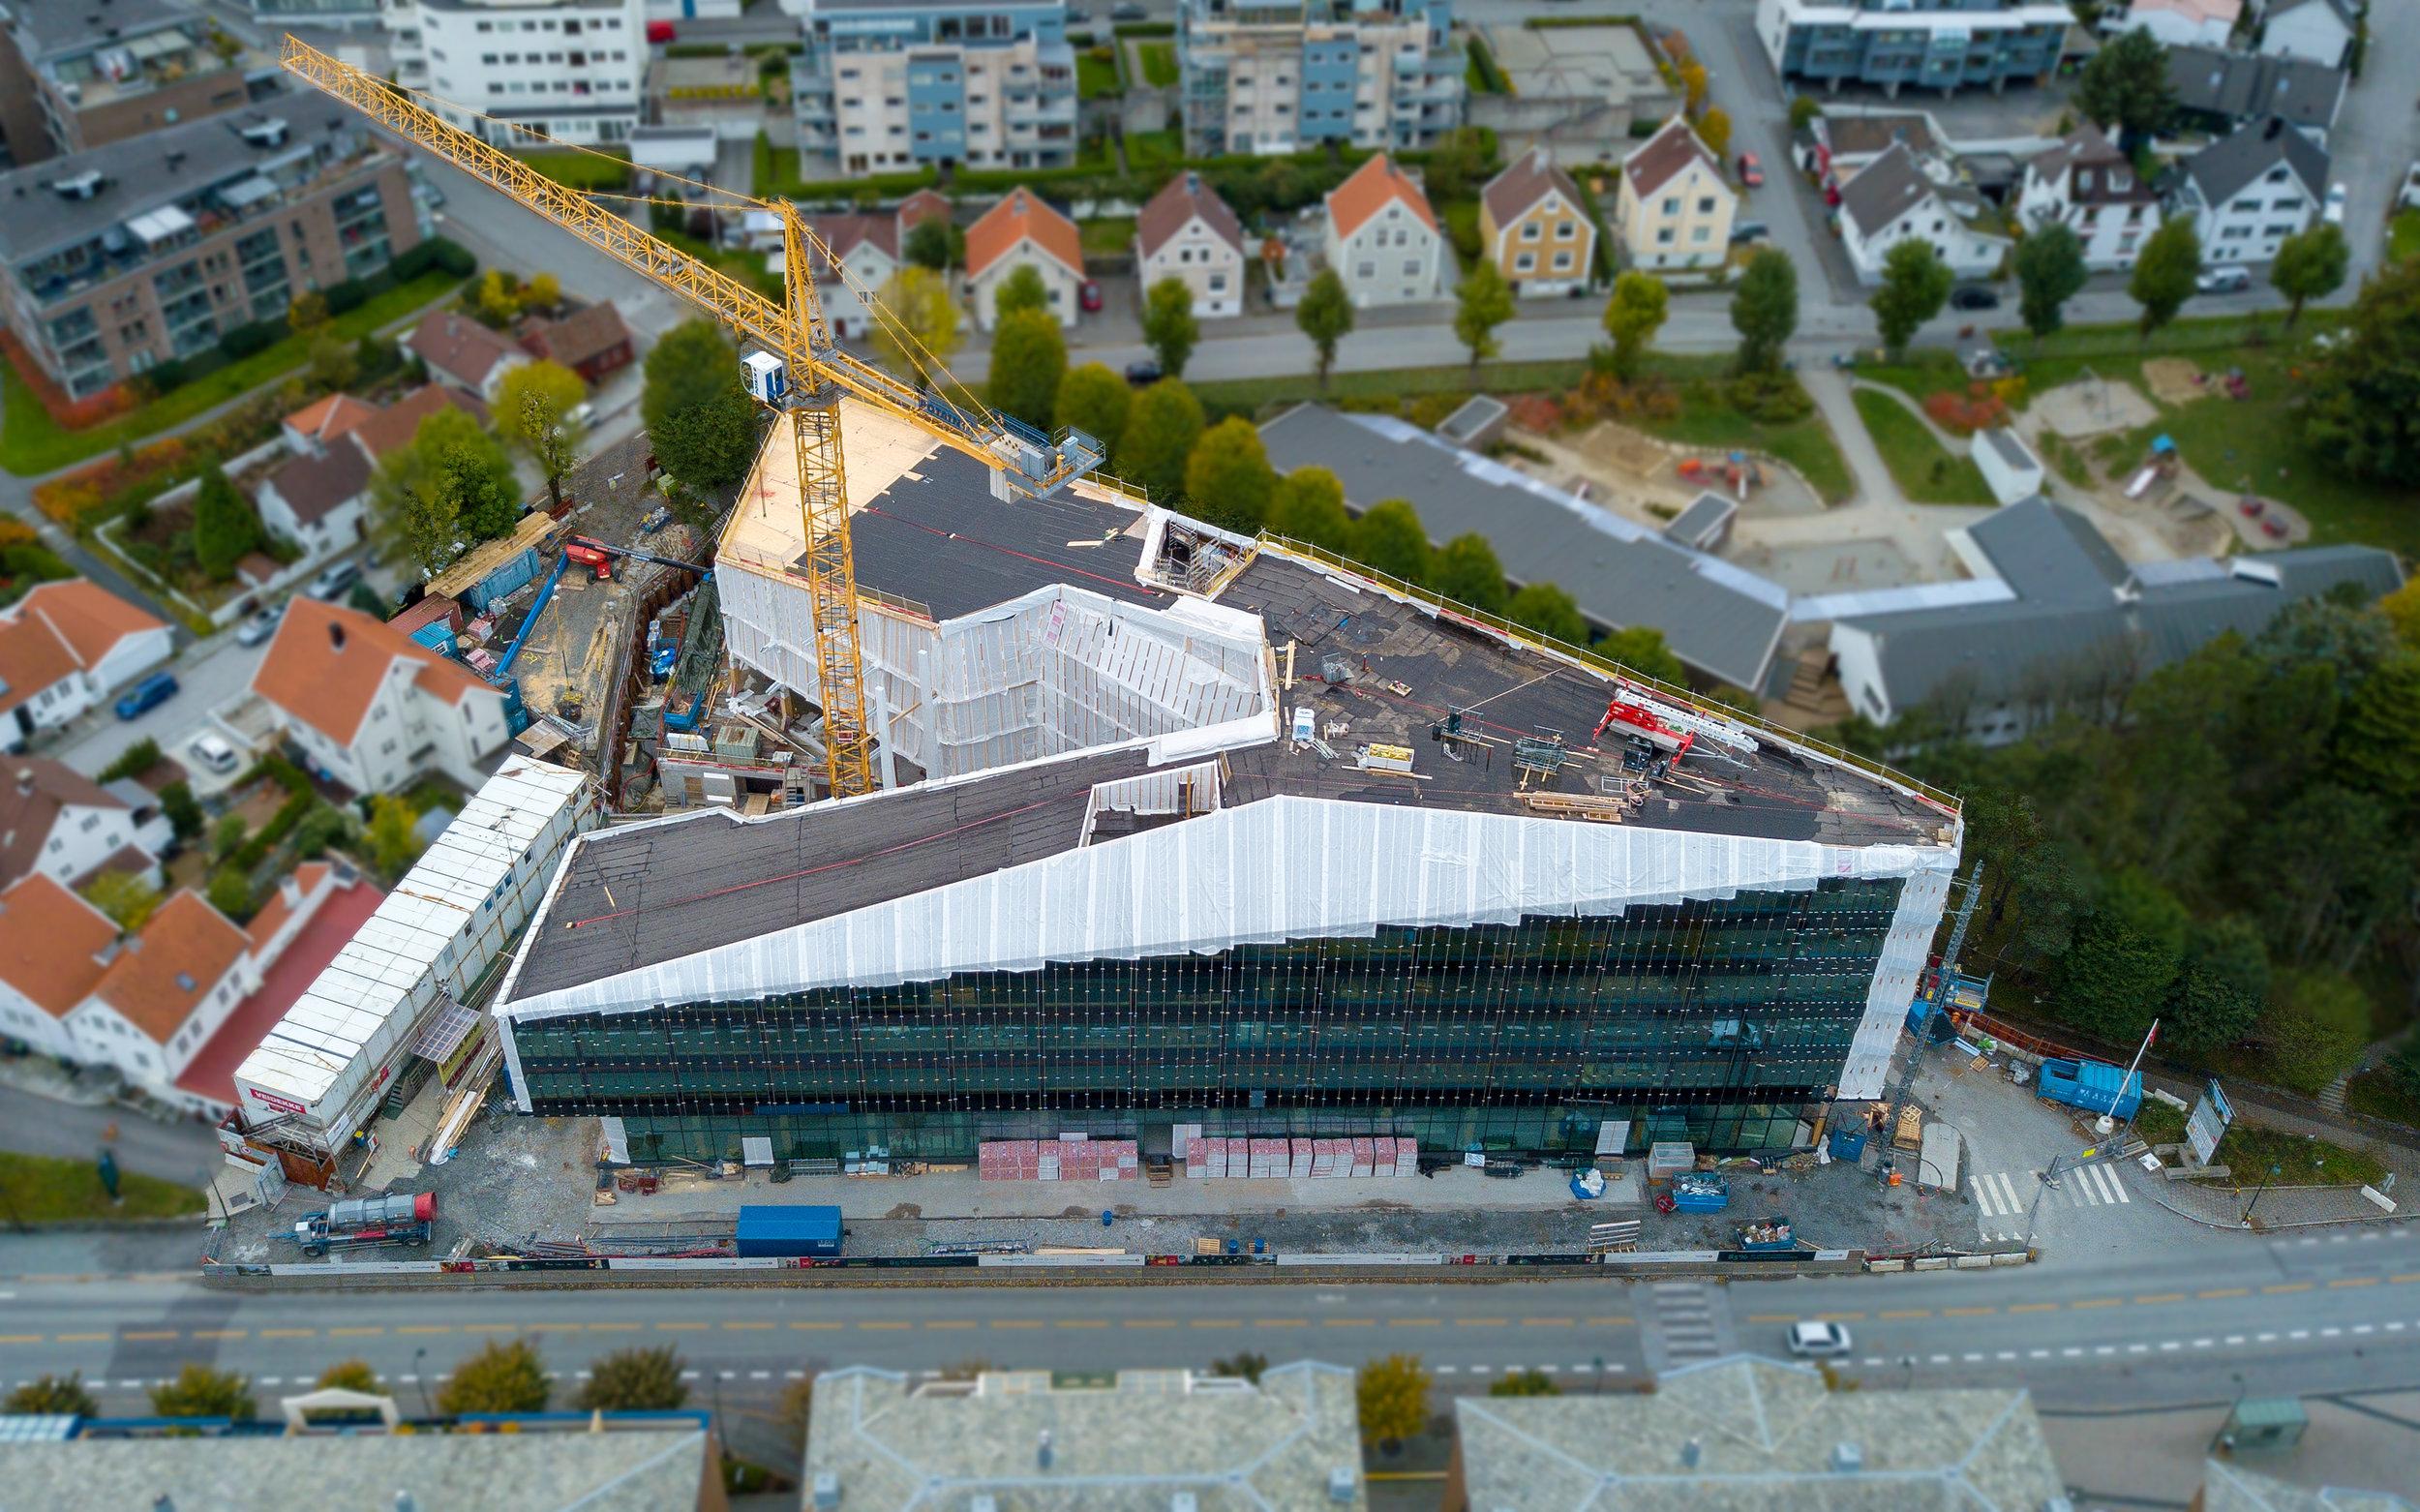 FINANSPARKEN: Slik ser bygget ut i oktober 2018. Foto: 3D4D.no